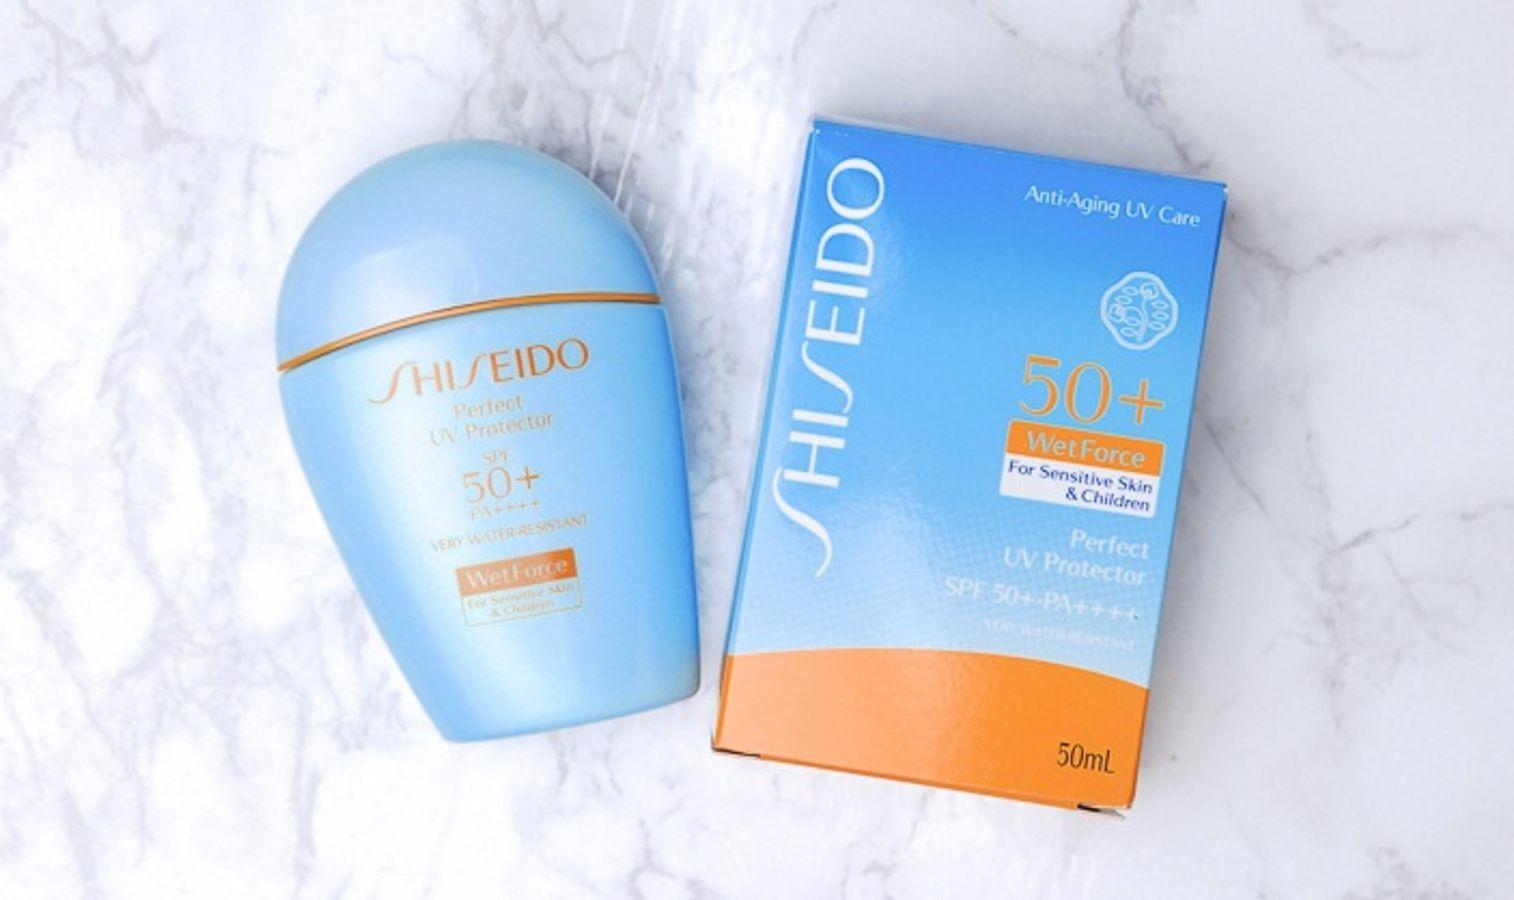 Kem Chống Nắng Shiseido Perfect UV Protector S